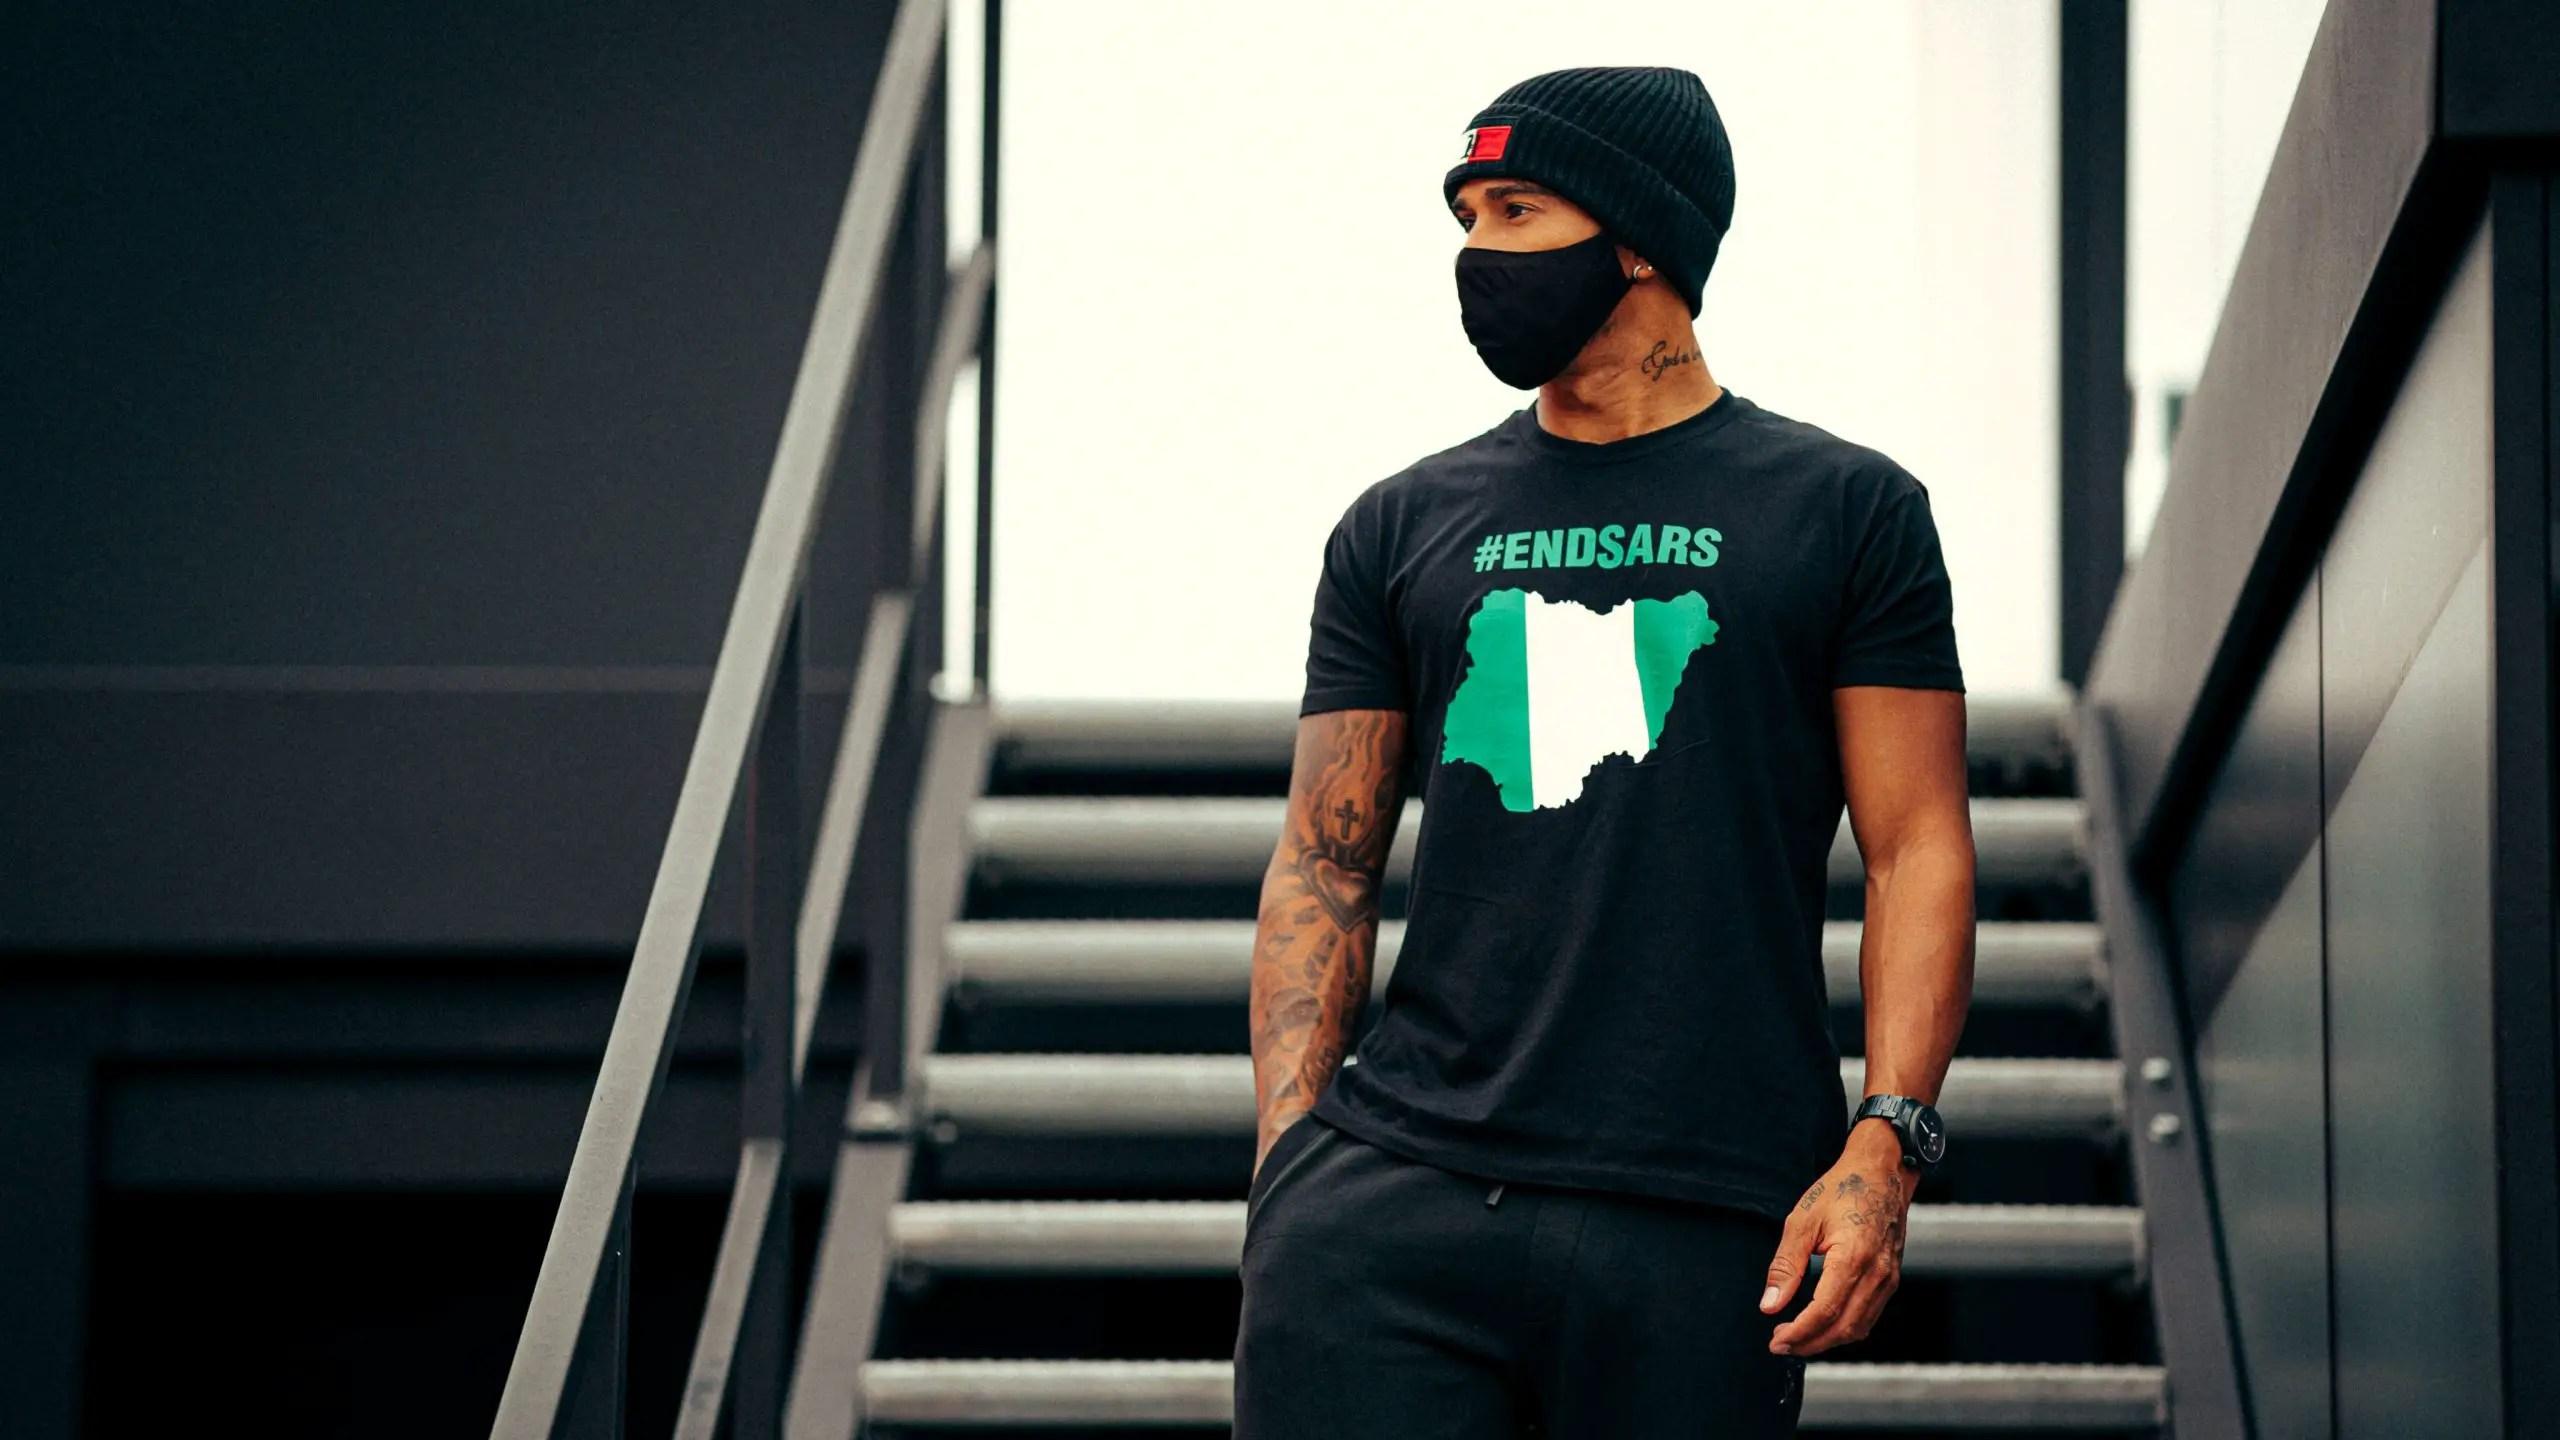 F1 Star Hamilton Reacts To #EndSar Protest In Nigeria